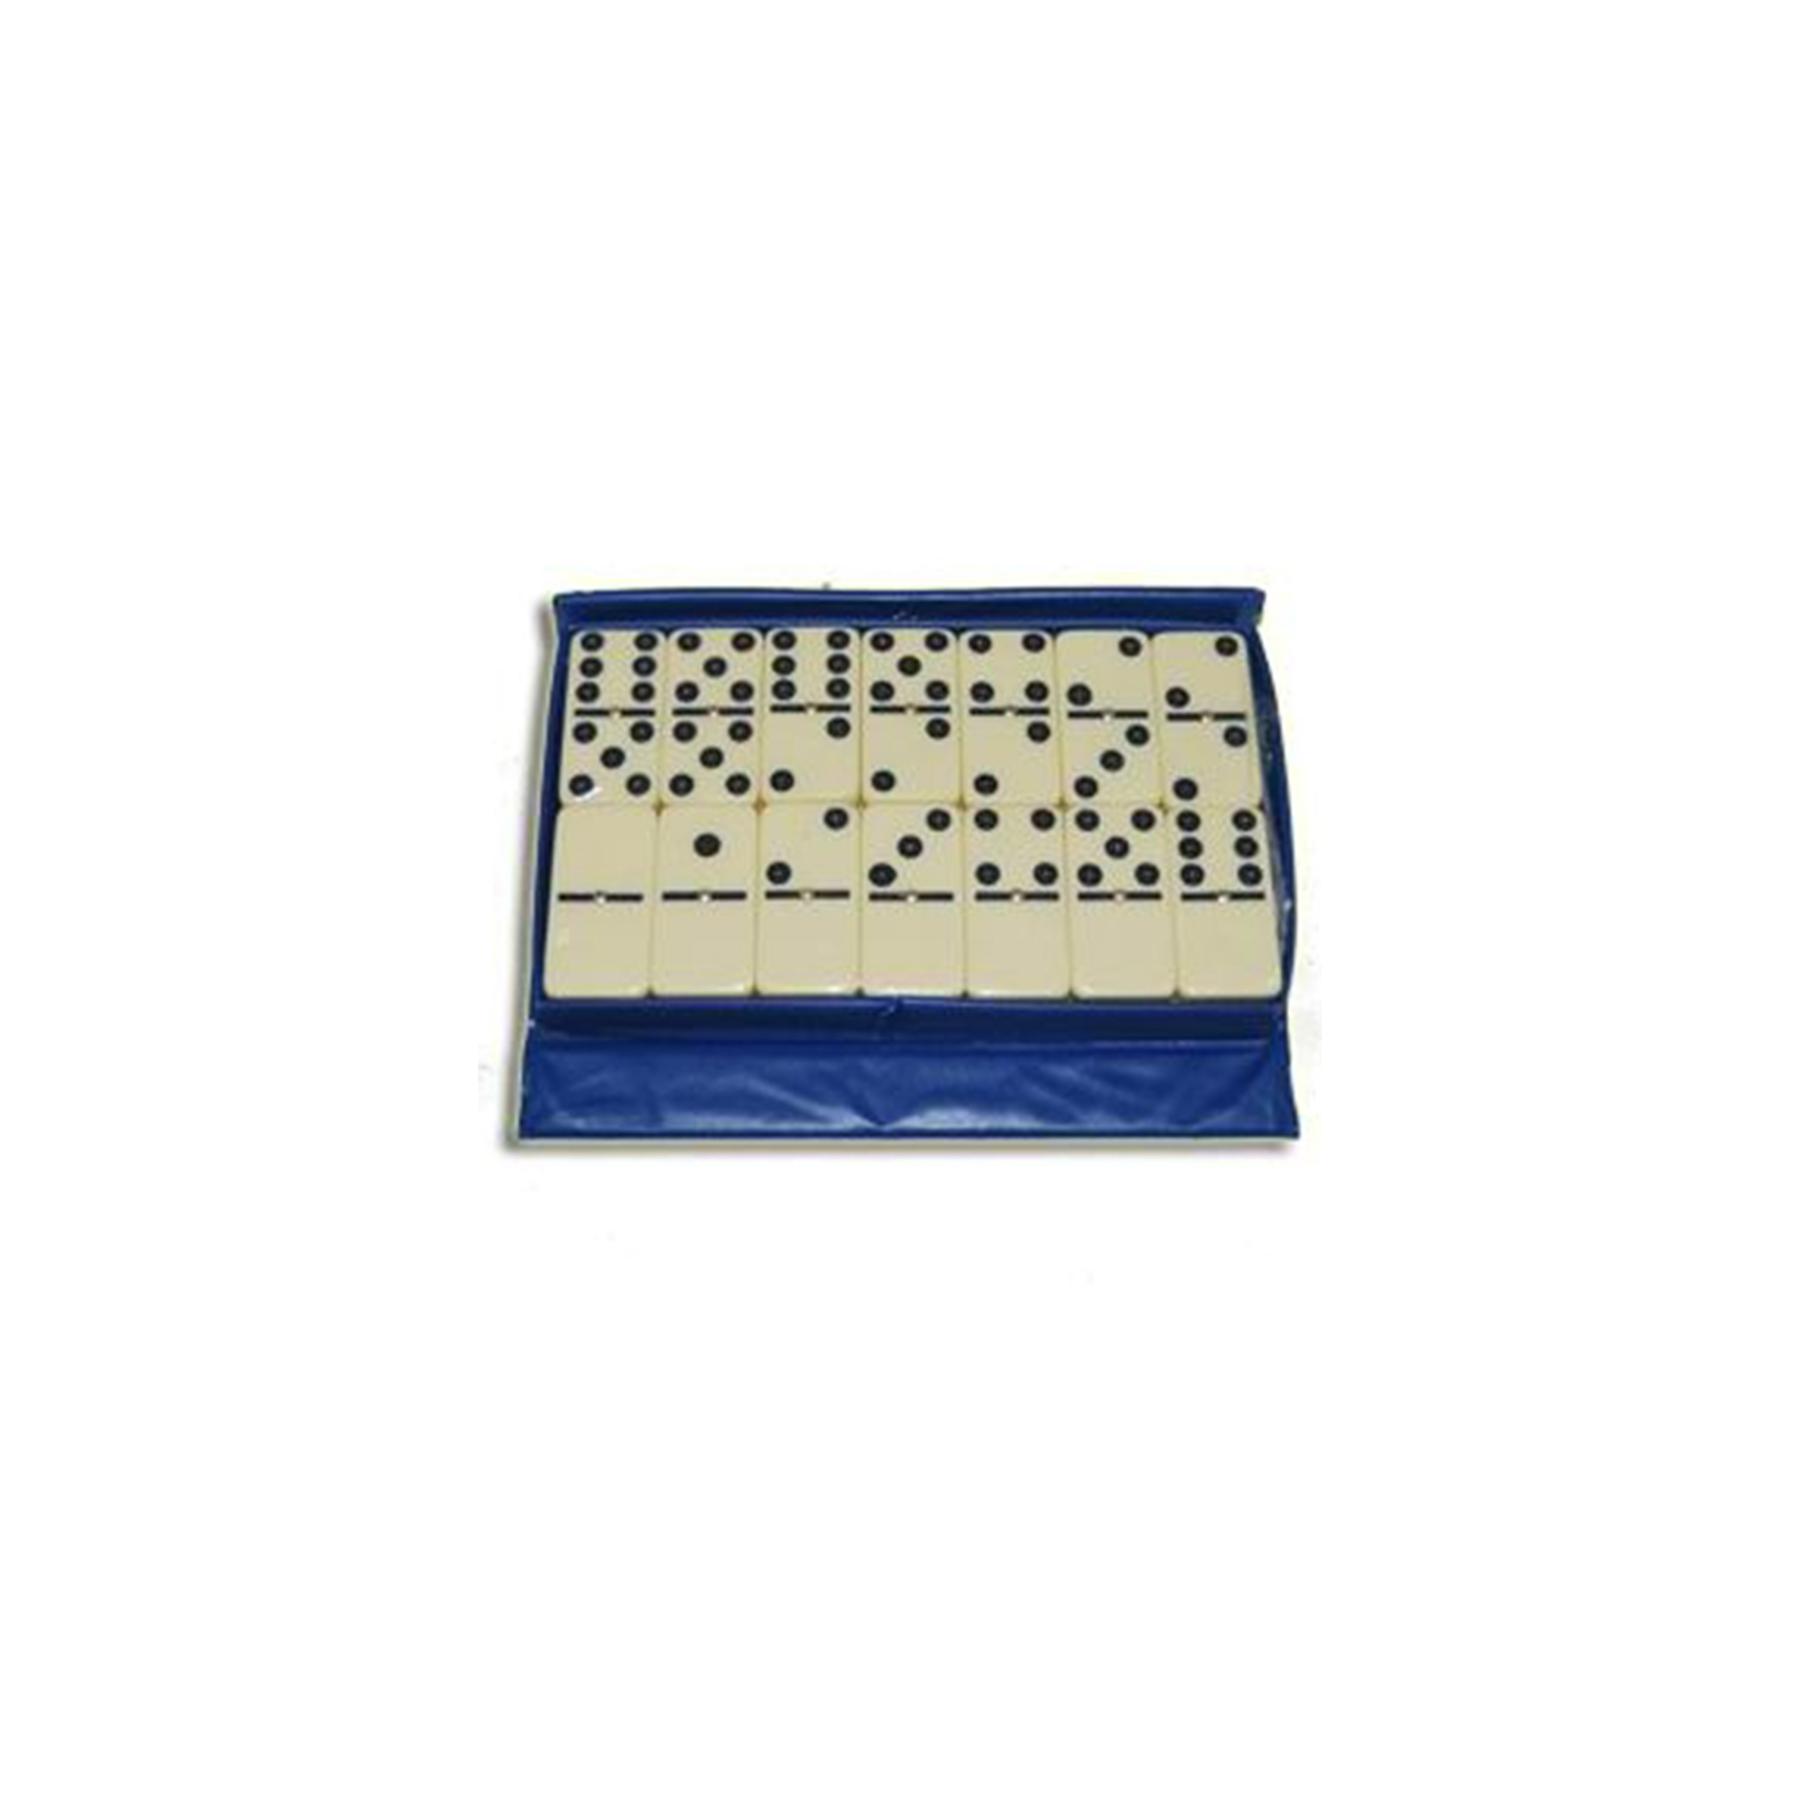 Домино в картонной коробке. Материал: пластмасса, картон. 5010Z (09047)